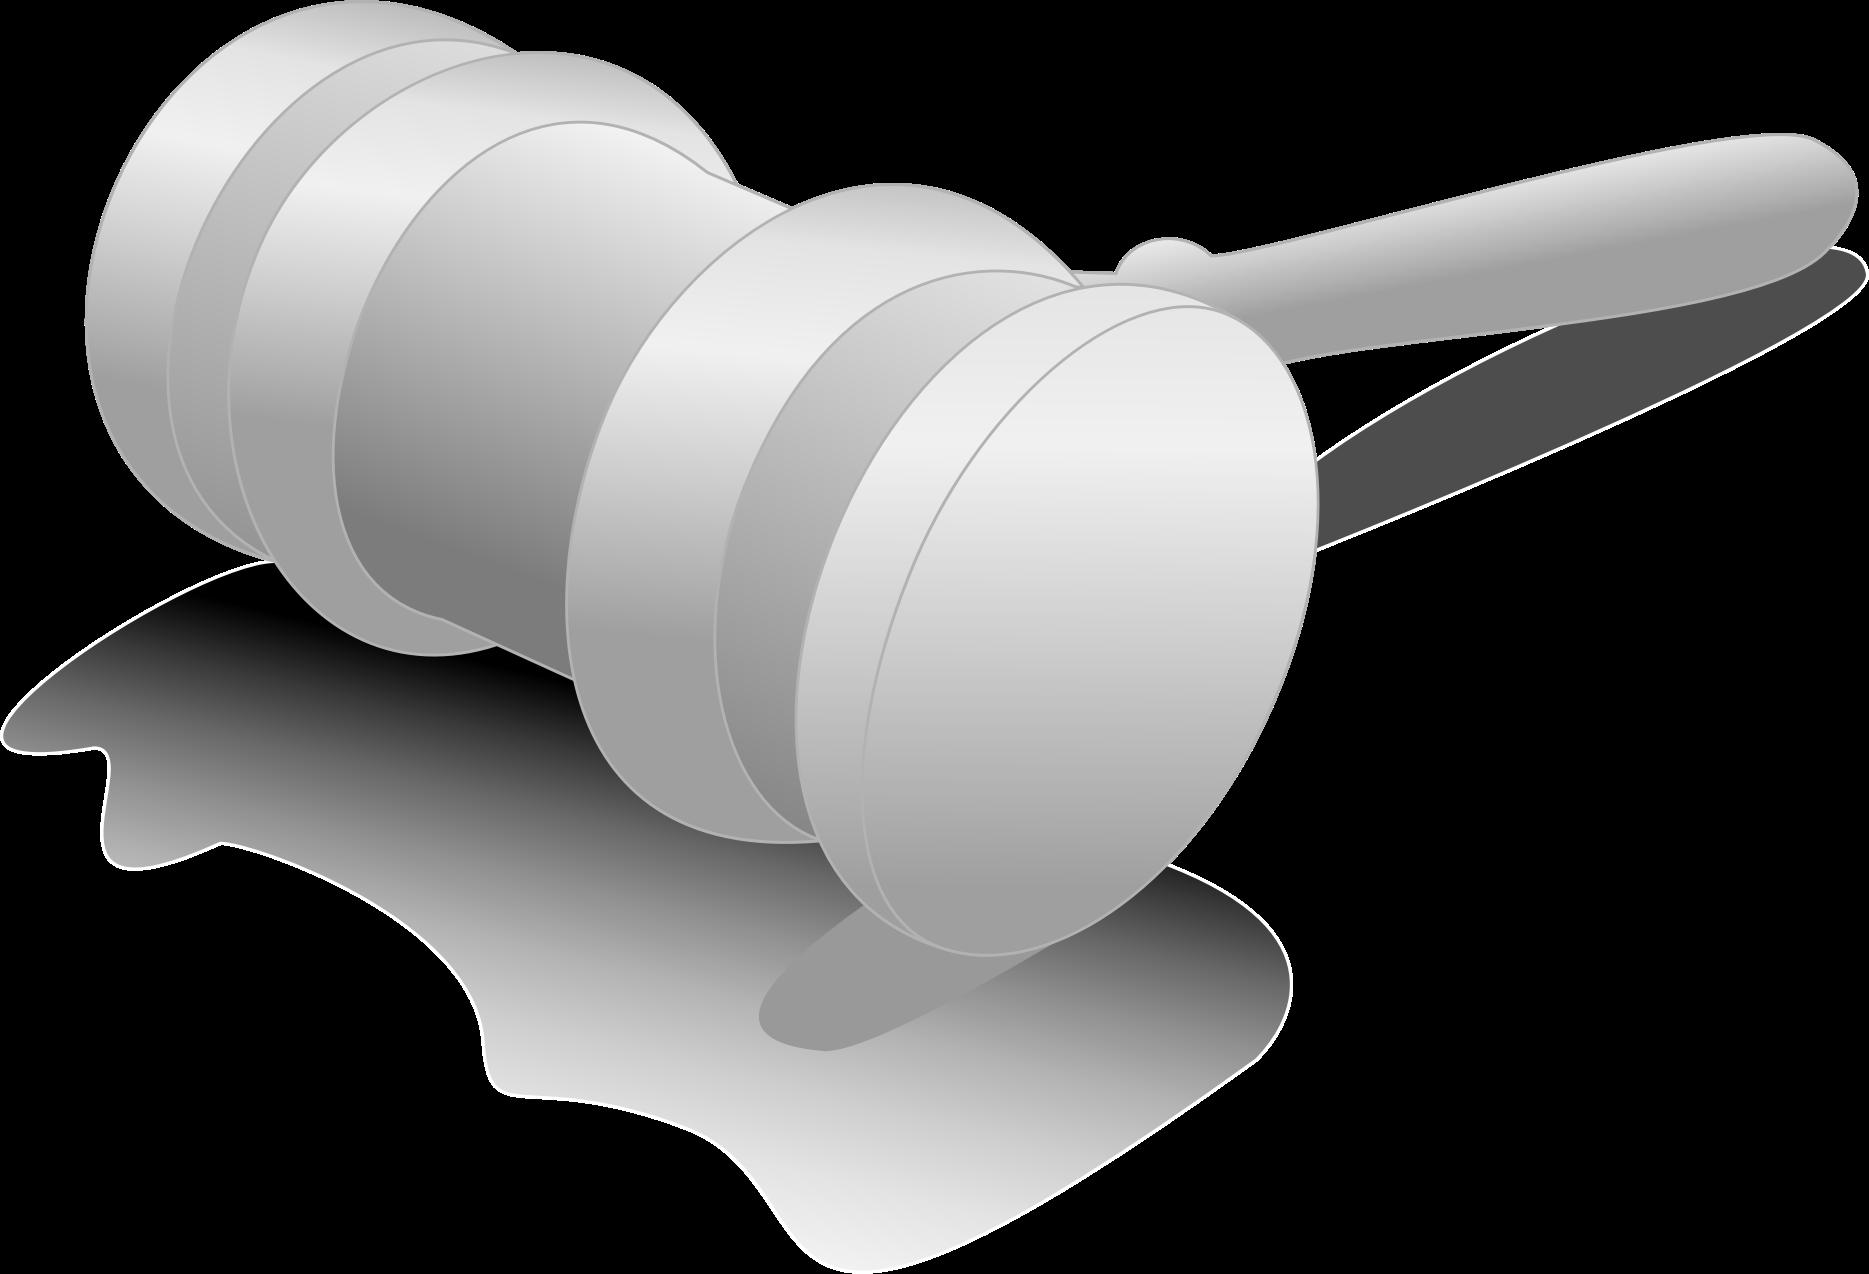 Court clipart hammer. Clipartblack com tools free